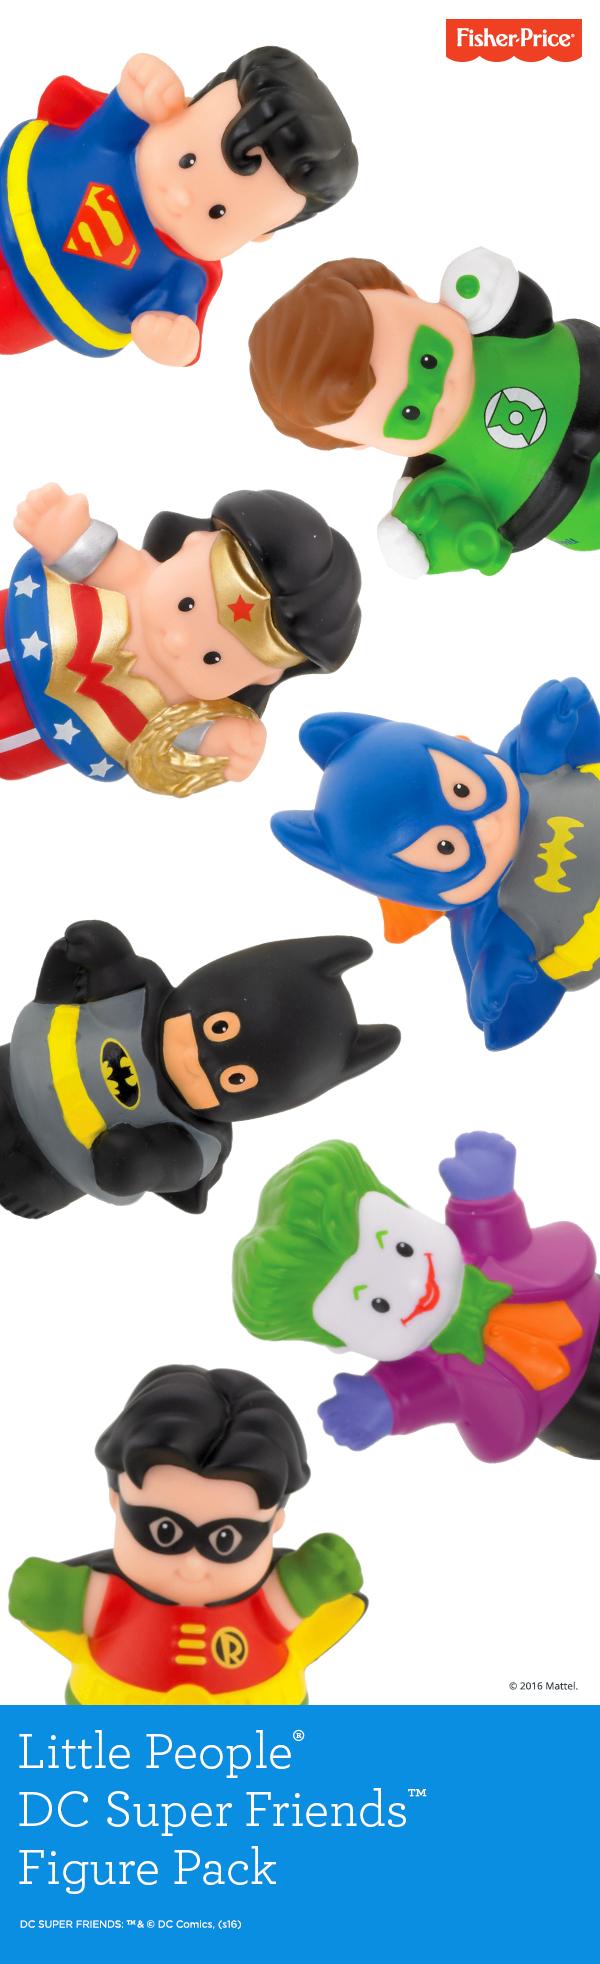 The Little People® DC Super Friends™ Figure Pack brings big ...